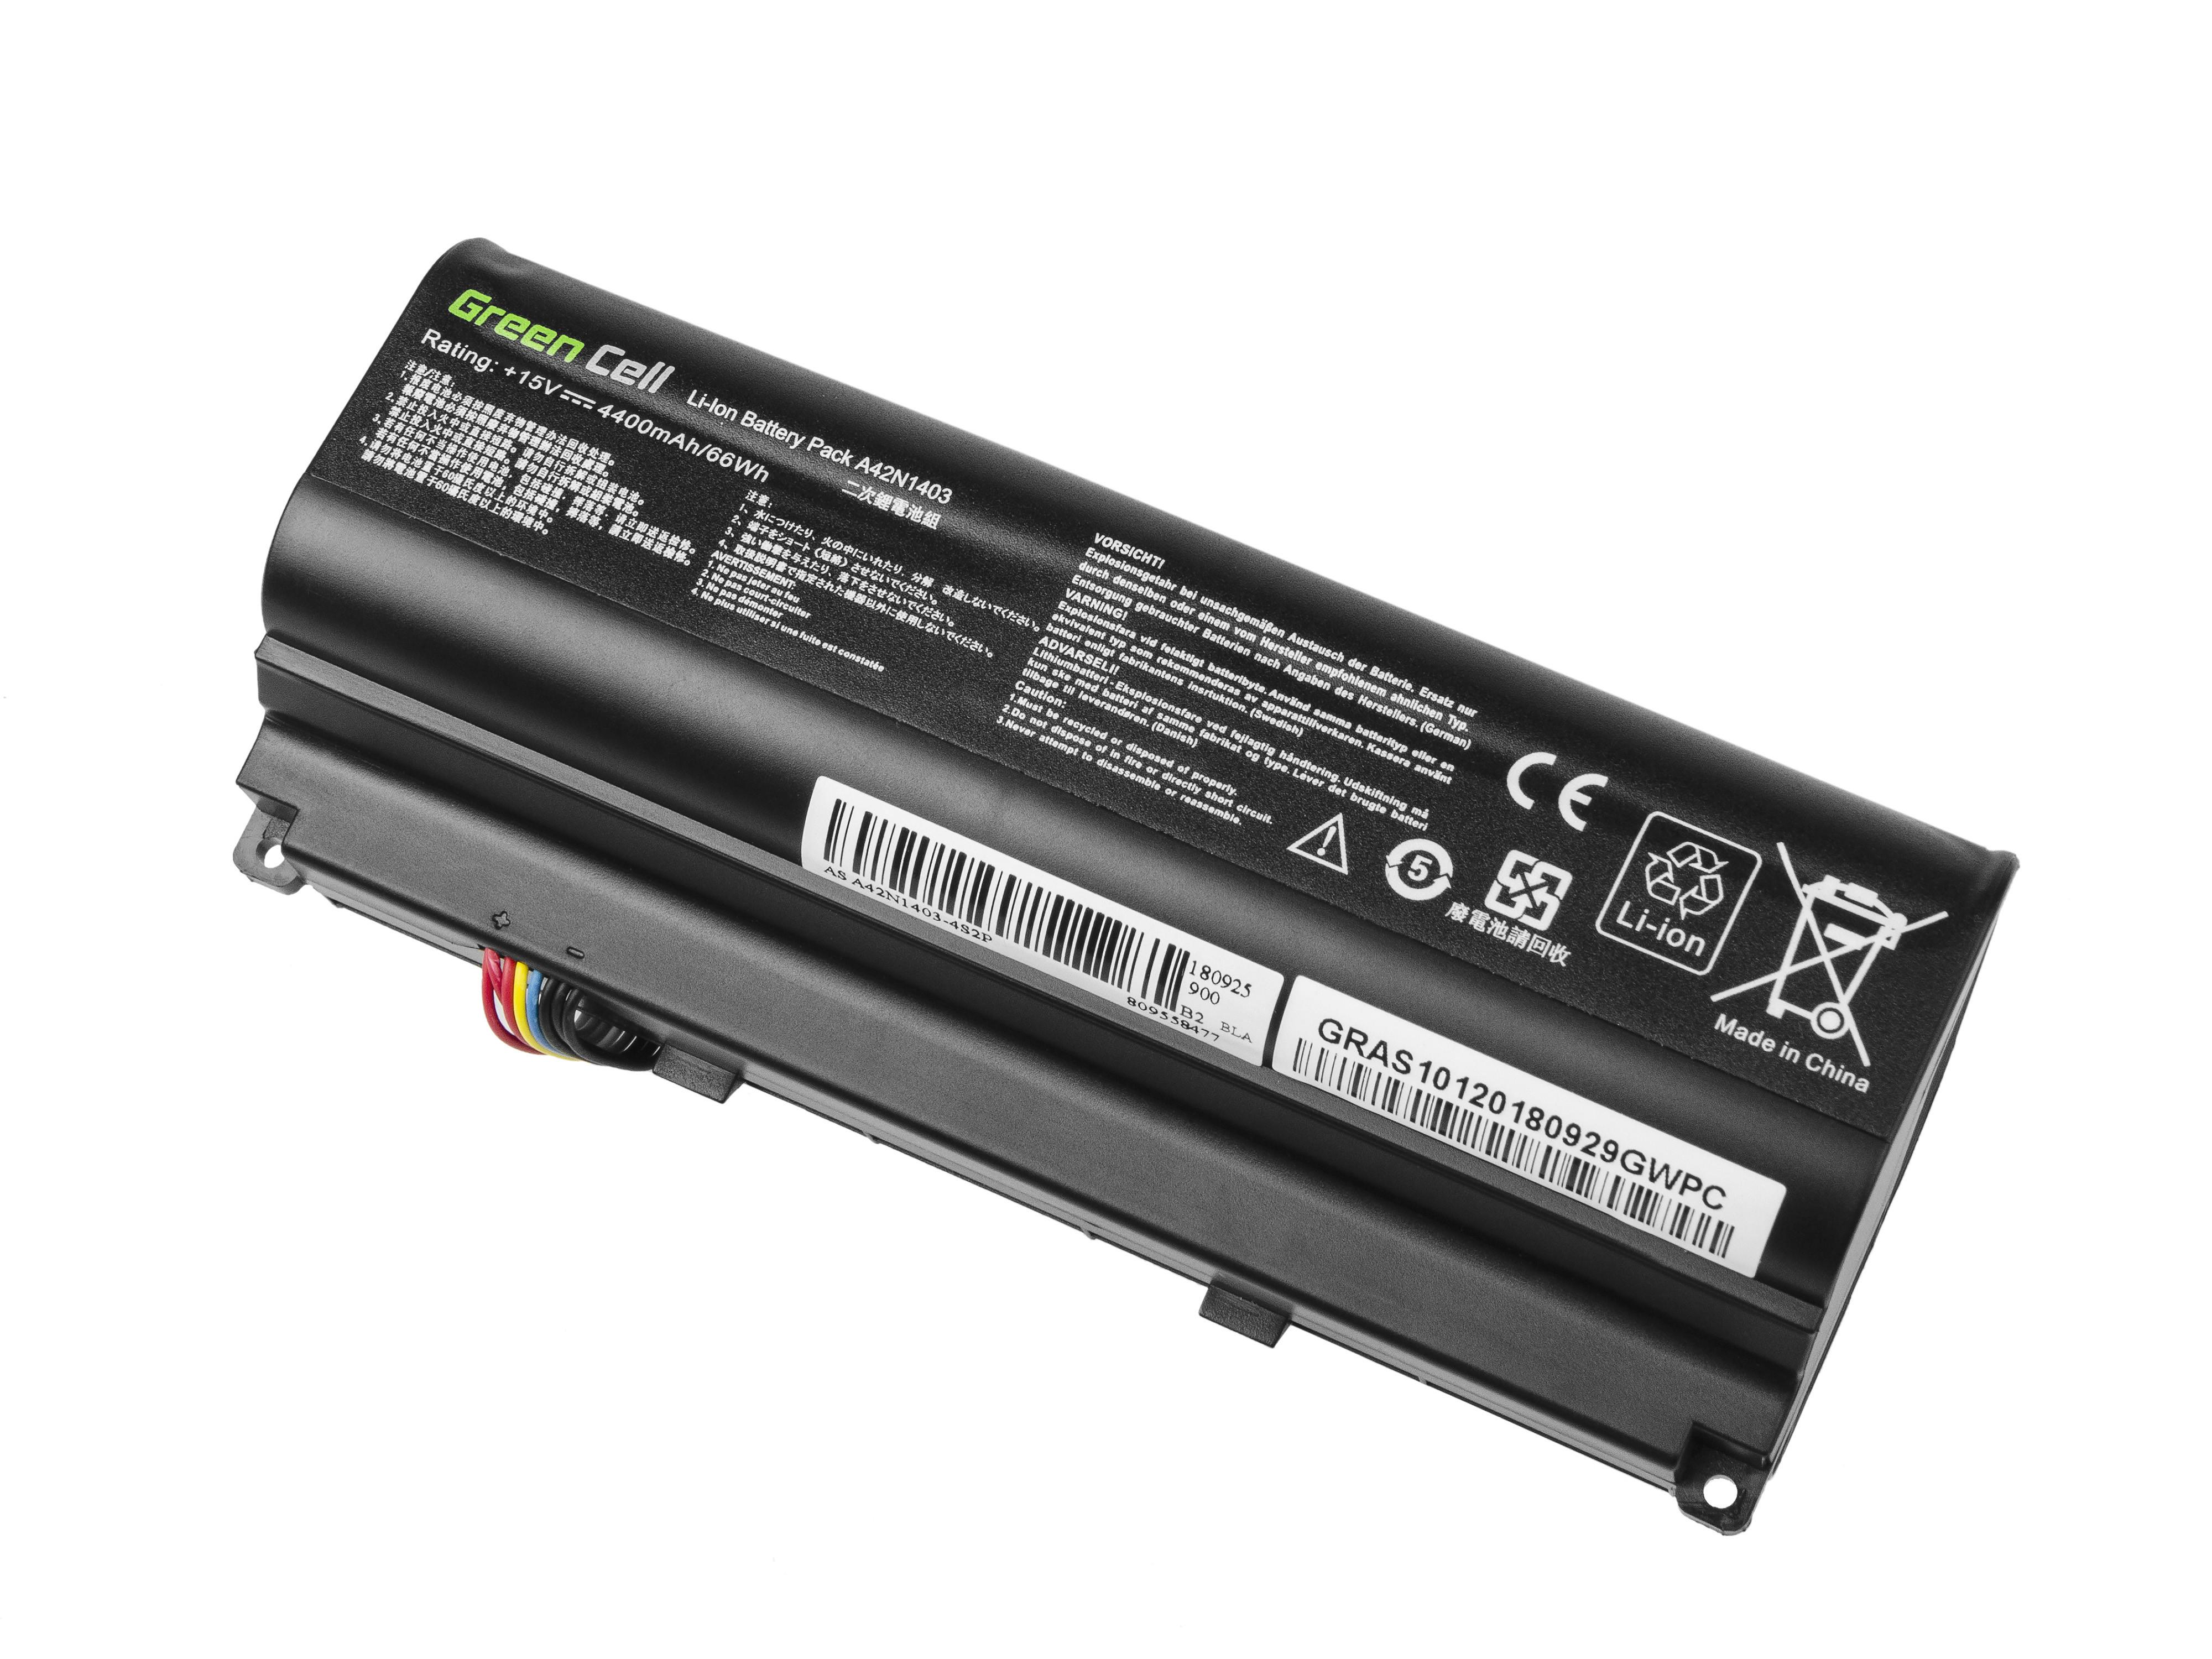 Green Cell AS128 Baterie Asus A42N1403/A42Nl403/Asus ROG/G751/G751JL/G751JM/G751JT 4400mAh Li-ion - neoriginální